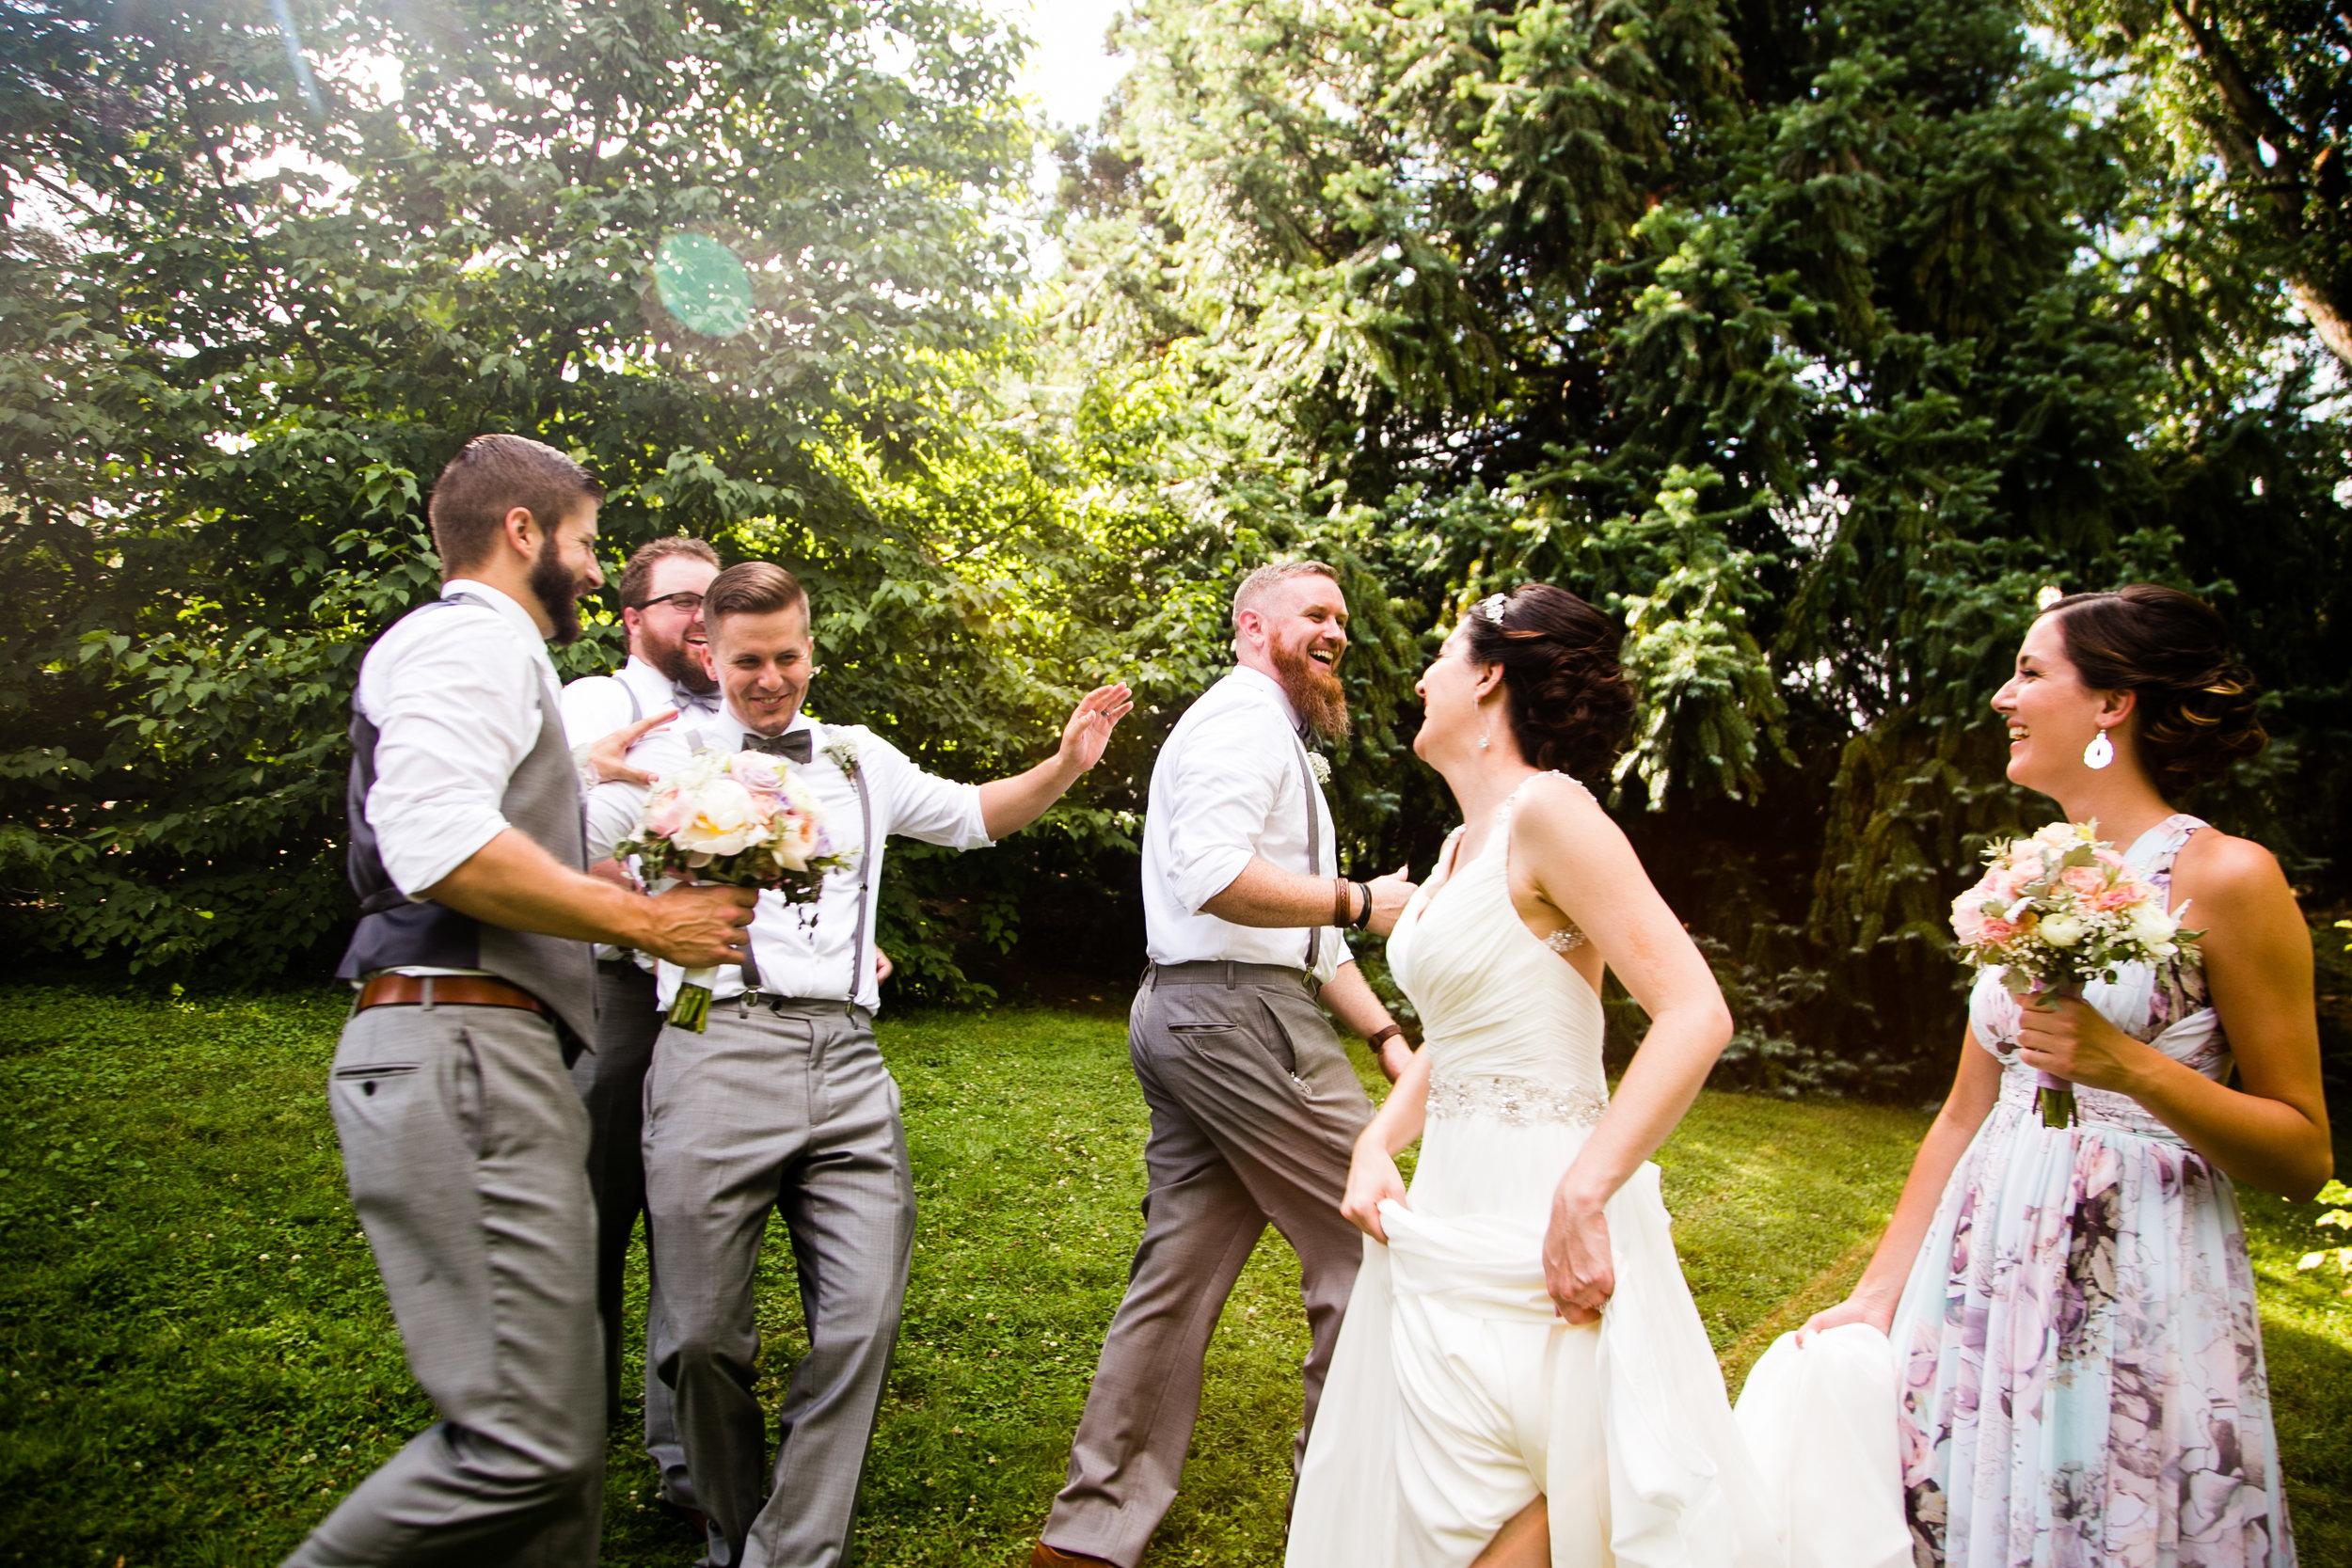 TYLER ARBORETUM WEDDING PHOTOGRAPHY LOVESTRUCK PICTURES-032.jpg